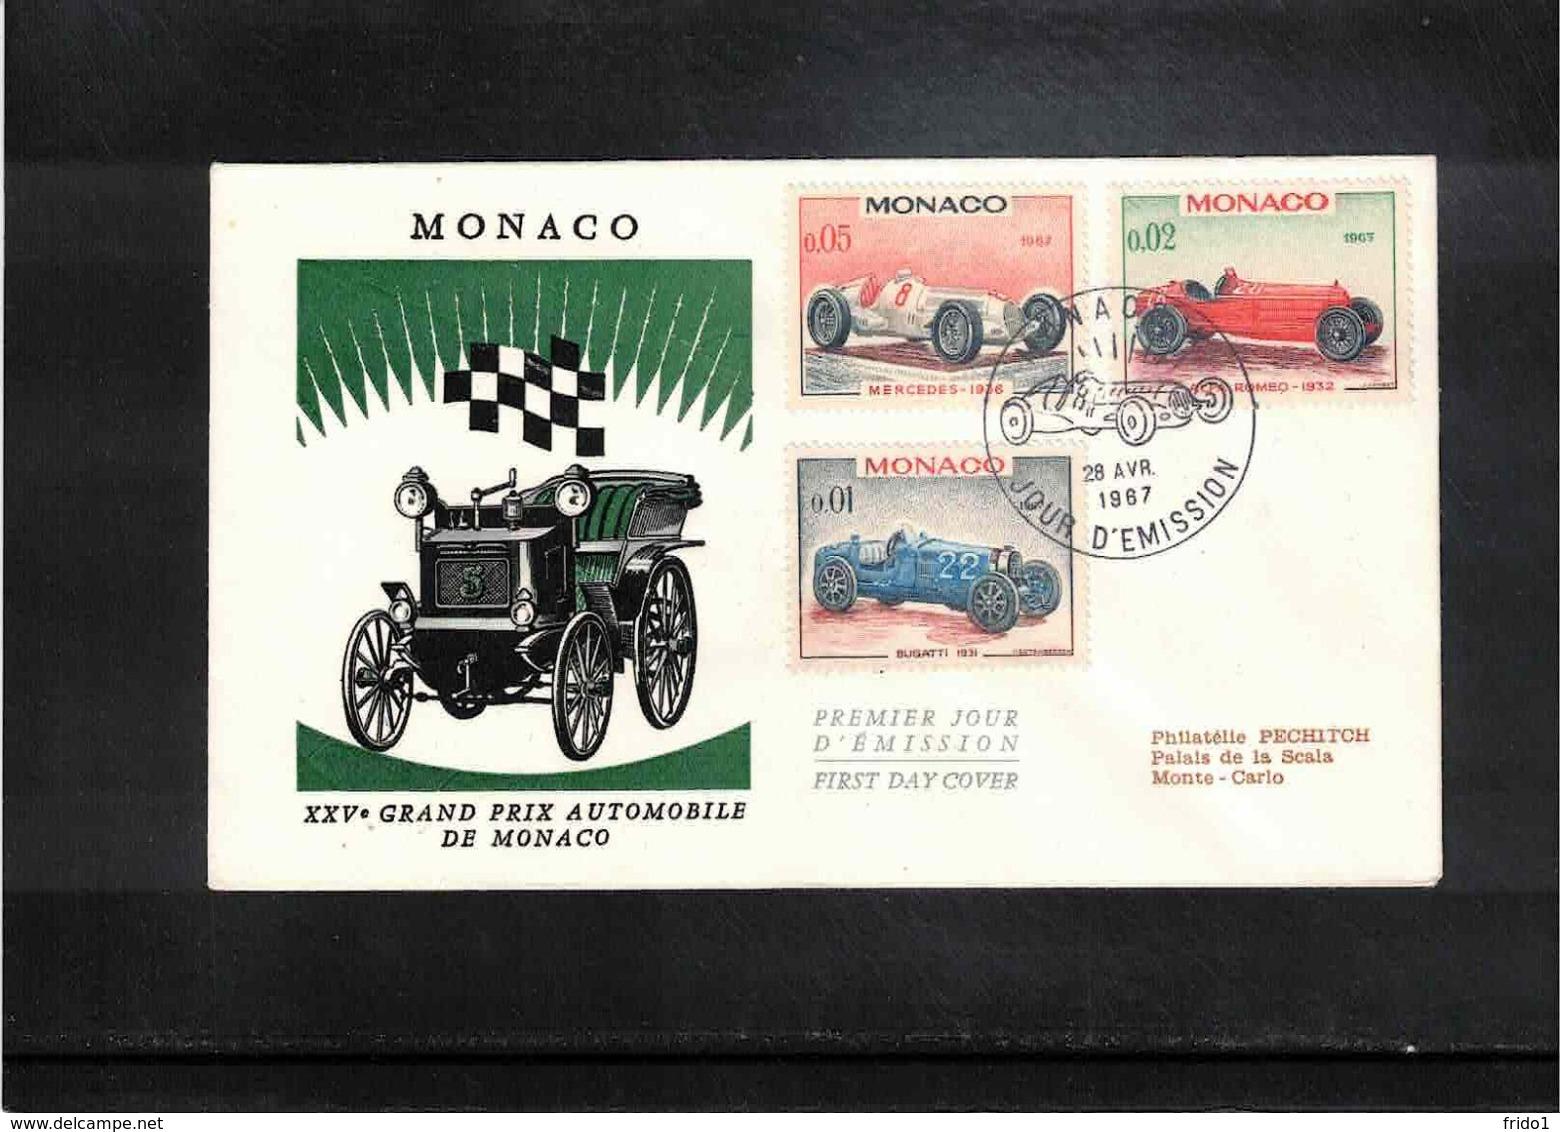 Monaco 1967 Car Racing Interesting Cover - Automobile